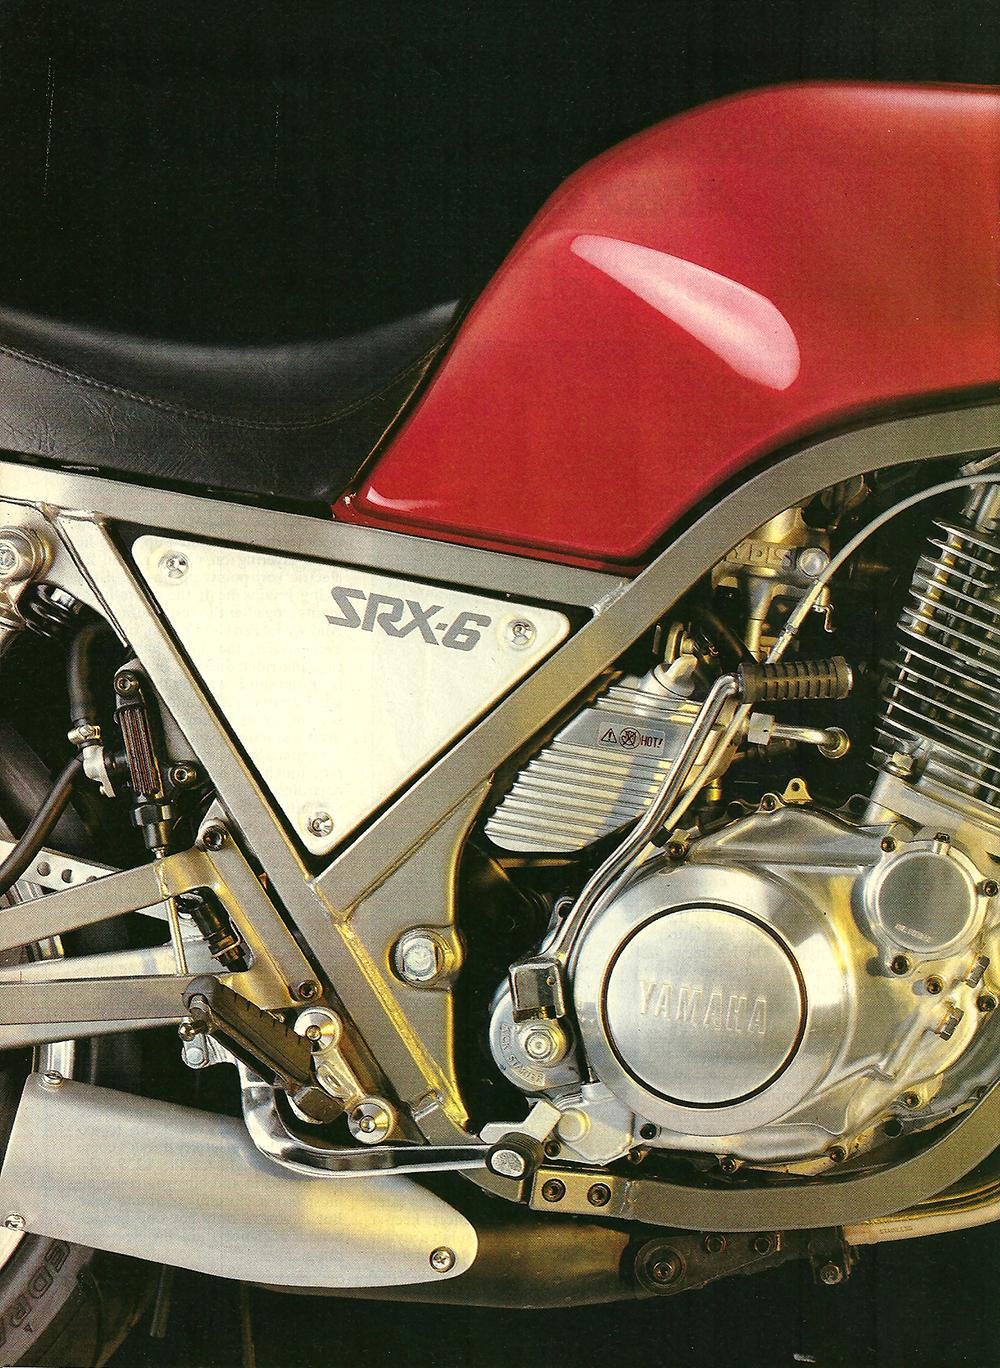 1986 Yamaha SRX600 road test 01.jpg